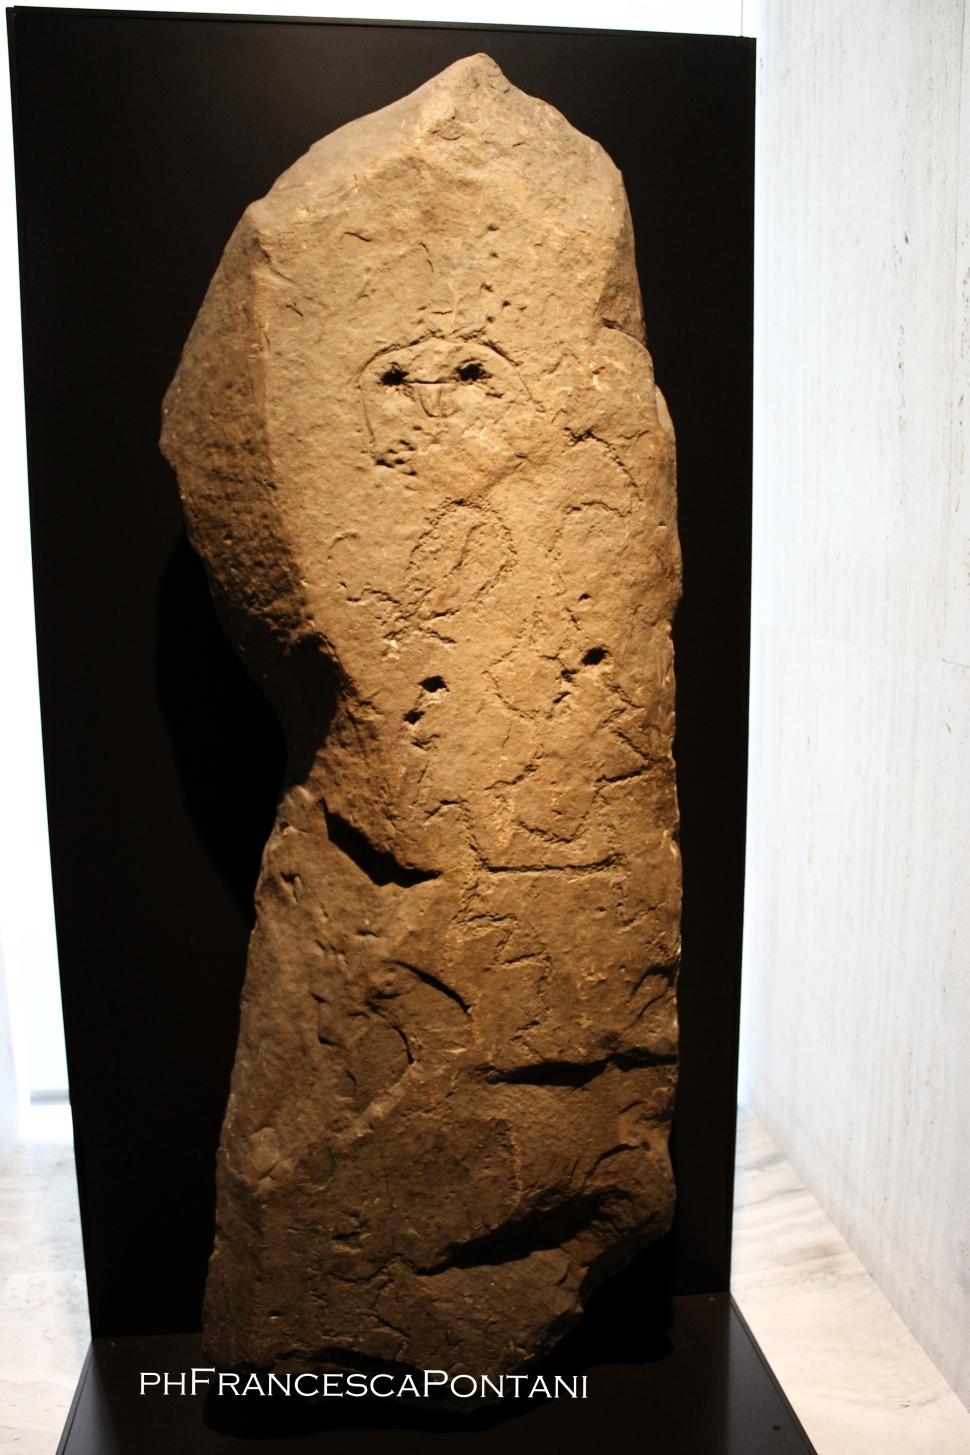 madrid_museo_archeologico_preistoria_stele